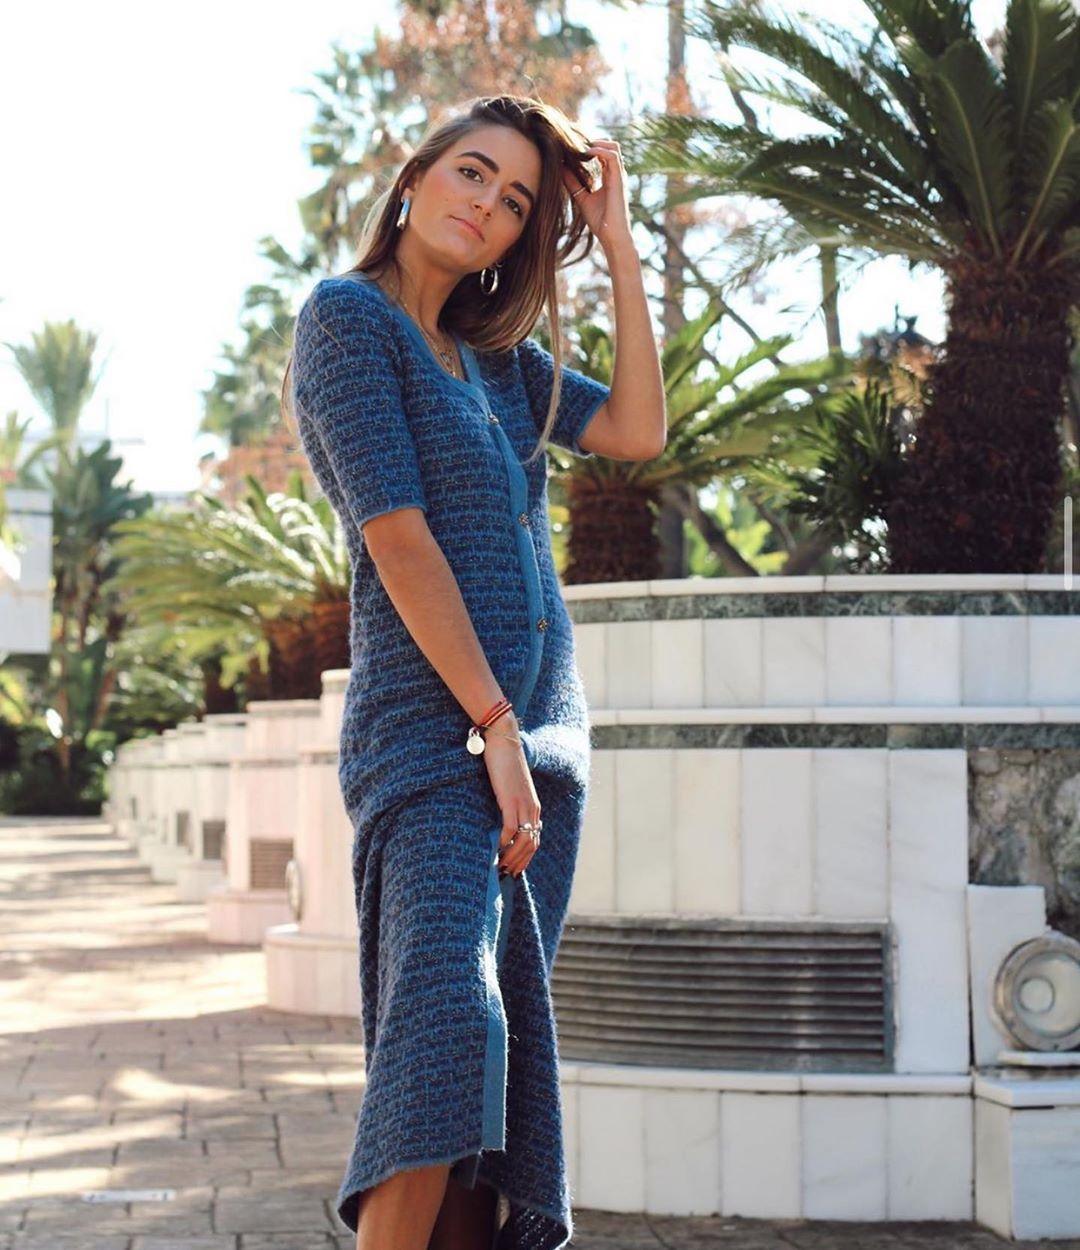 mesh dress with metallic thread de Zara sur zaraaddiction